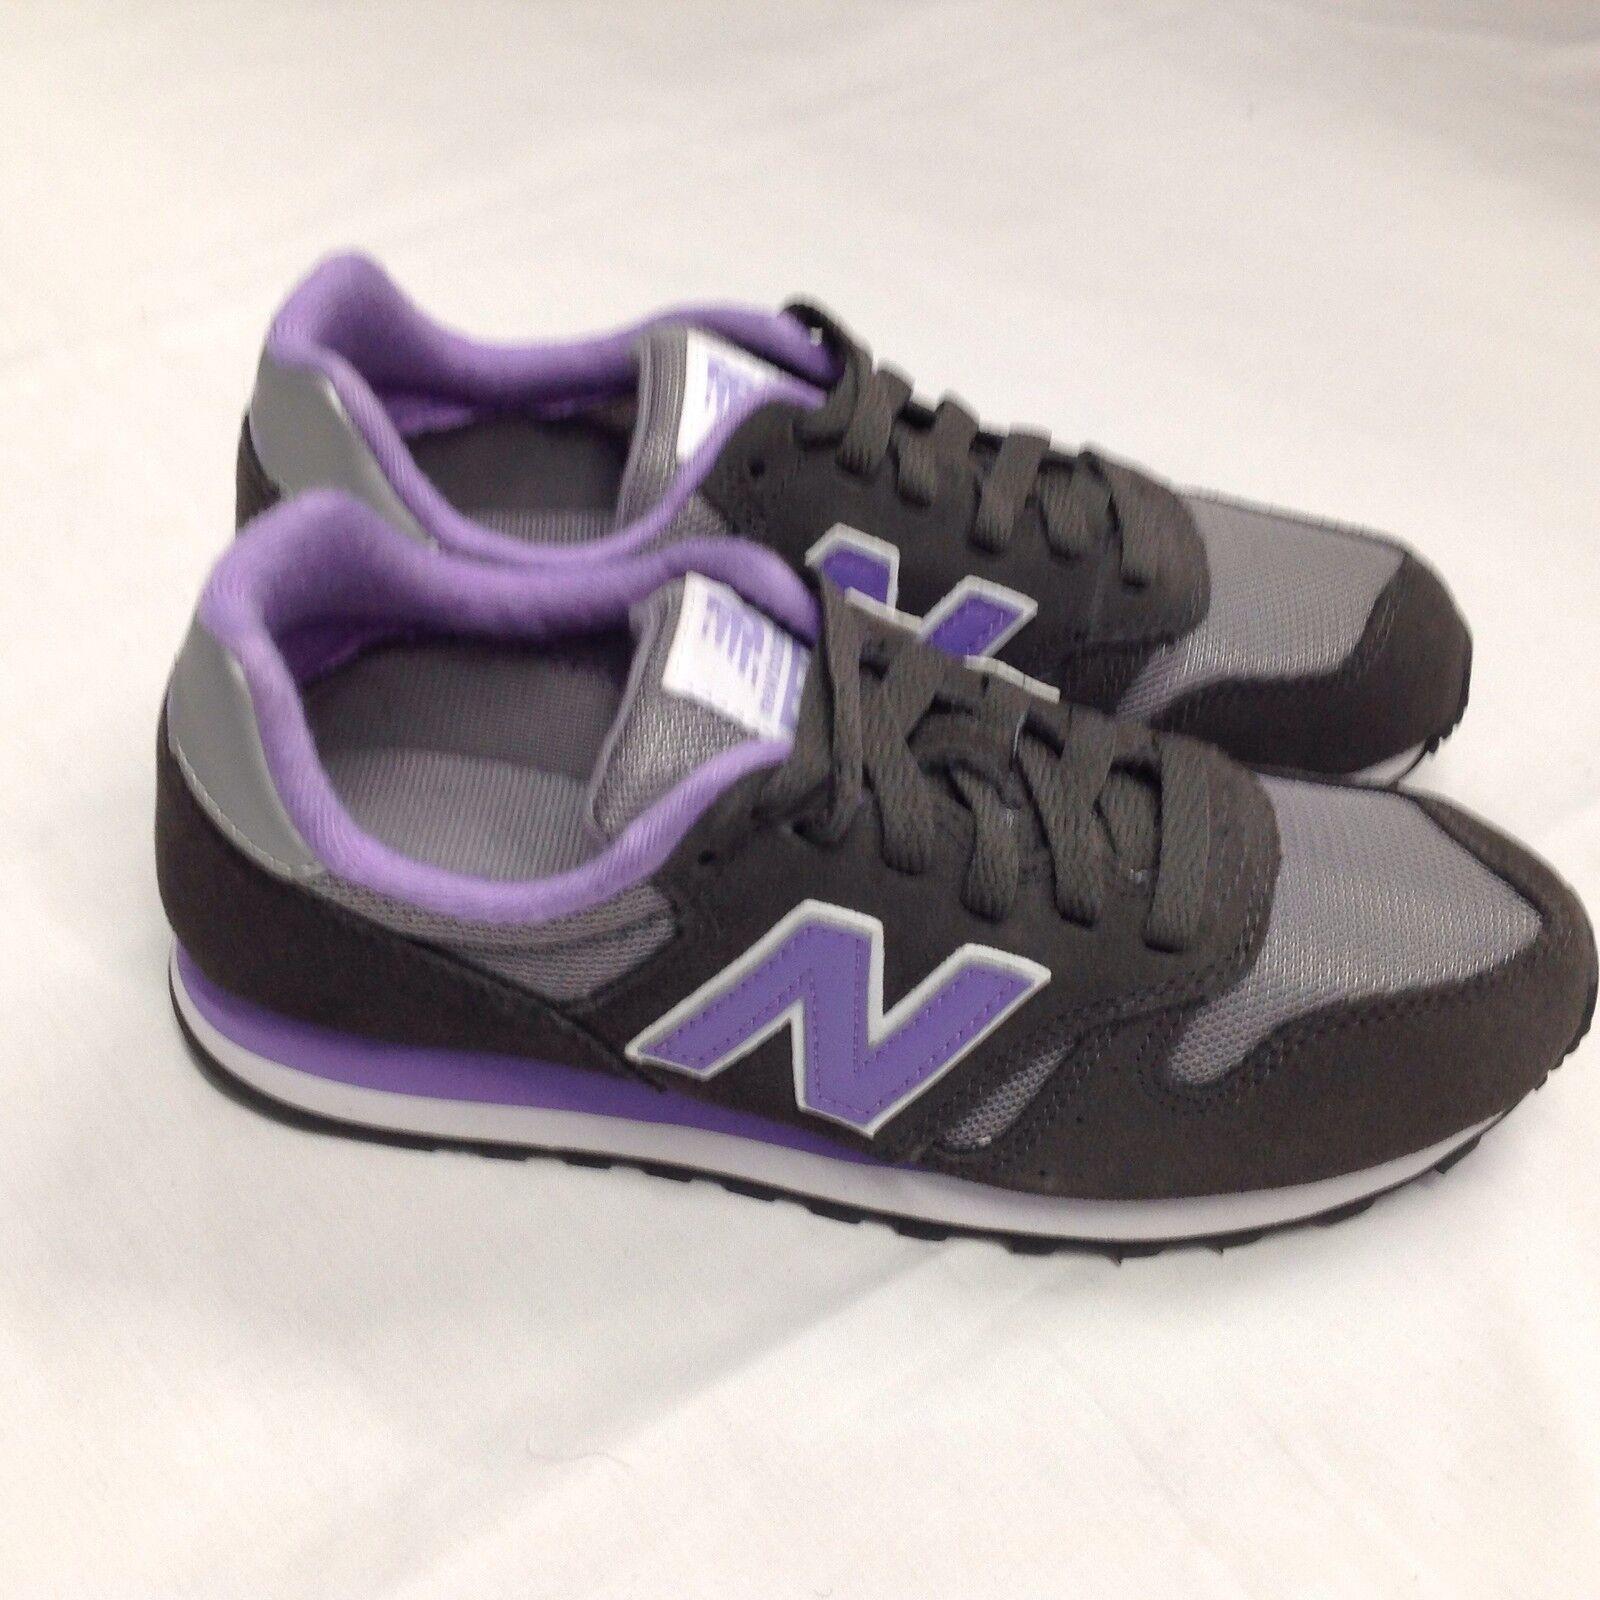 New Balance - 373 GR - Grey - Trainers,